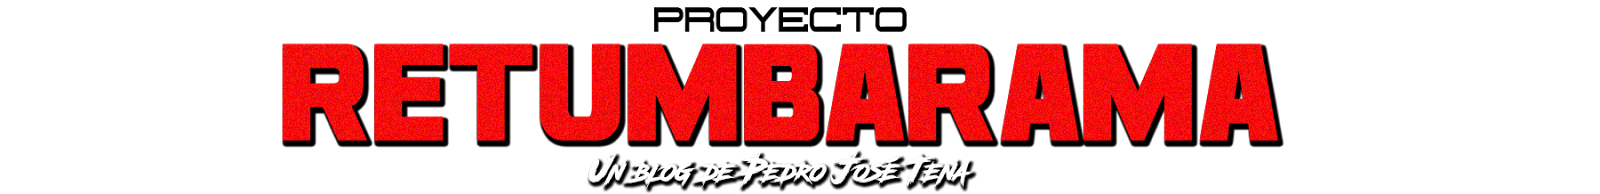 Proyecto Retumbarama